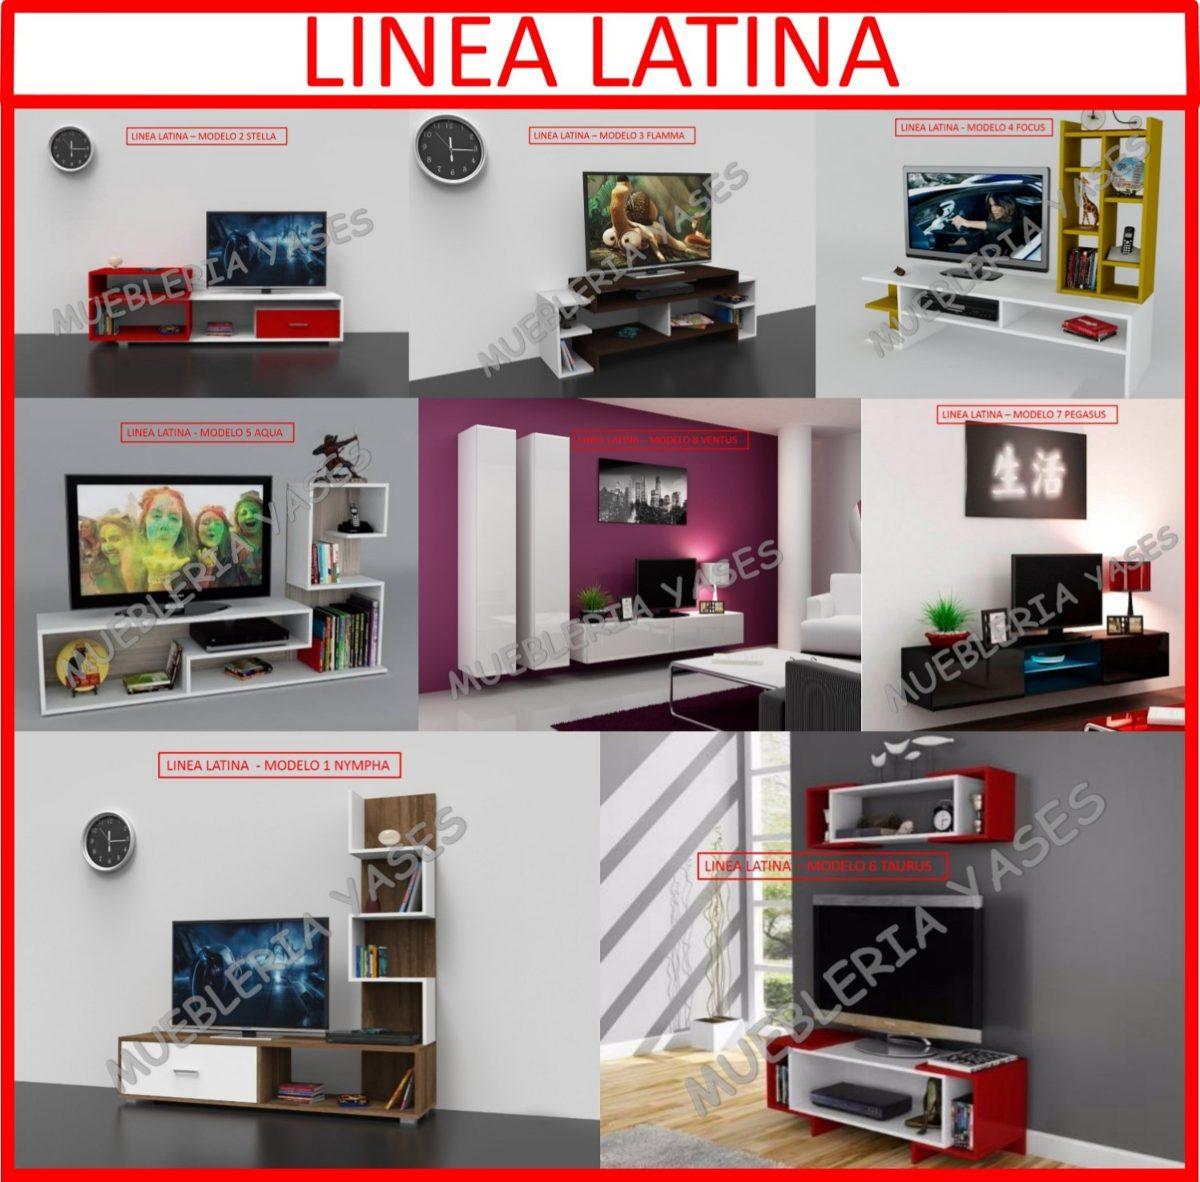 Mueble Sala Modulares Tv Moderno Entretenimiento Latina Bs  # Muebles Centro De Entretenimiento Moderno